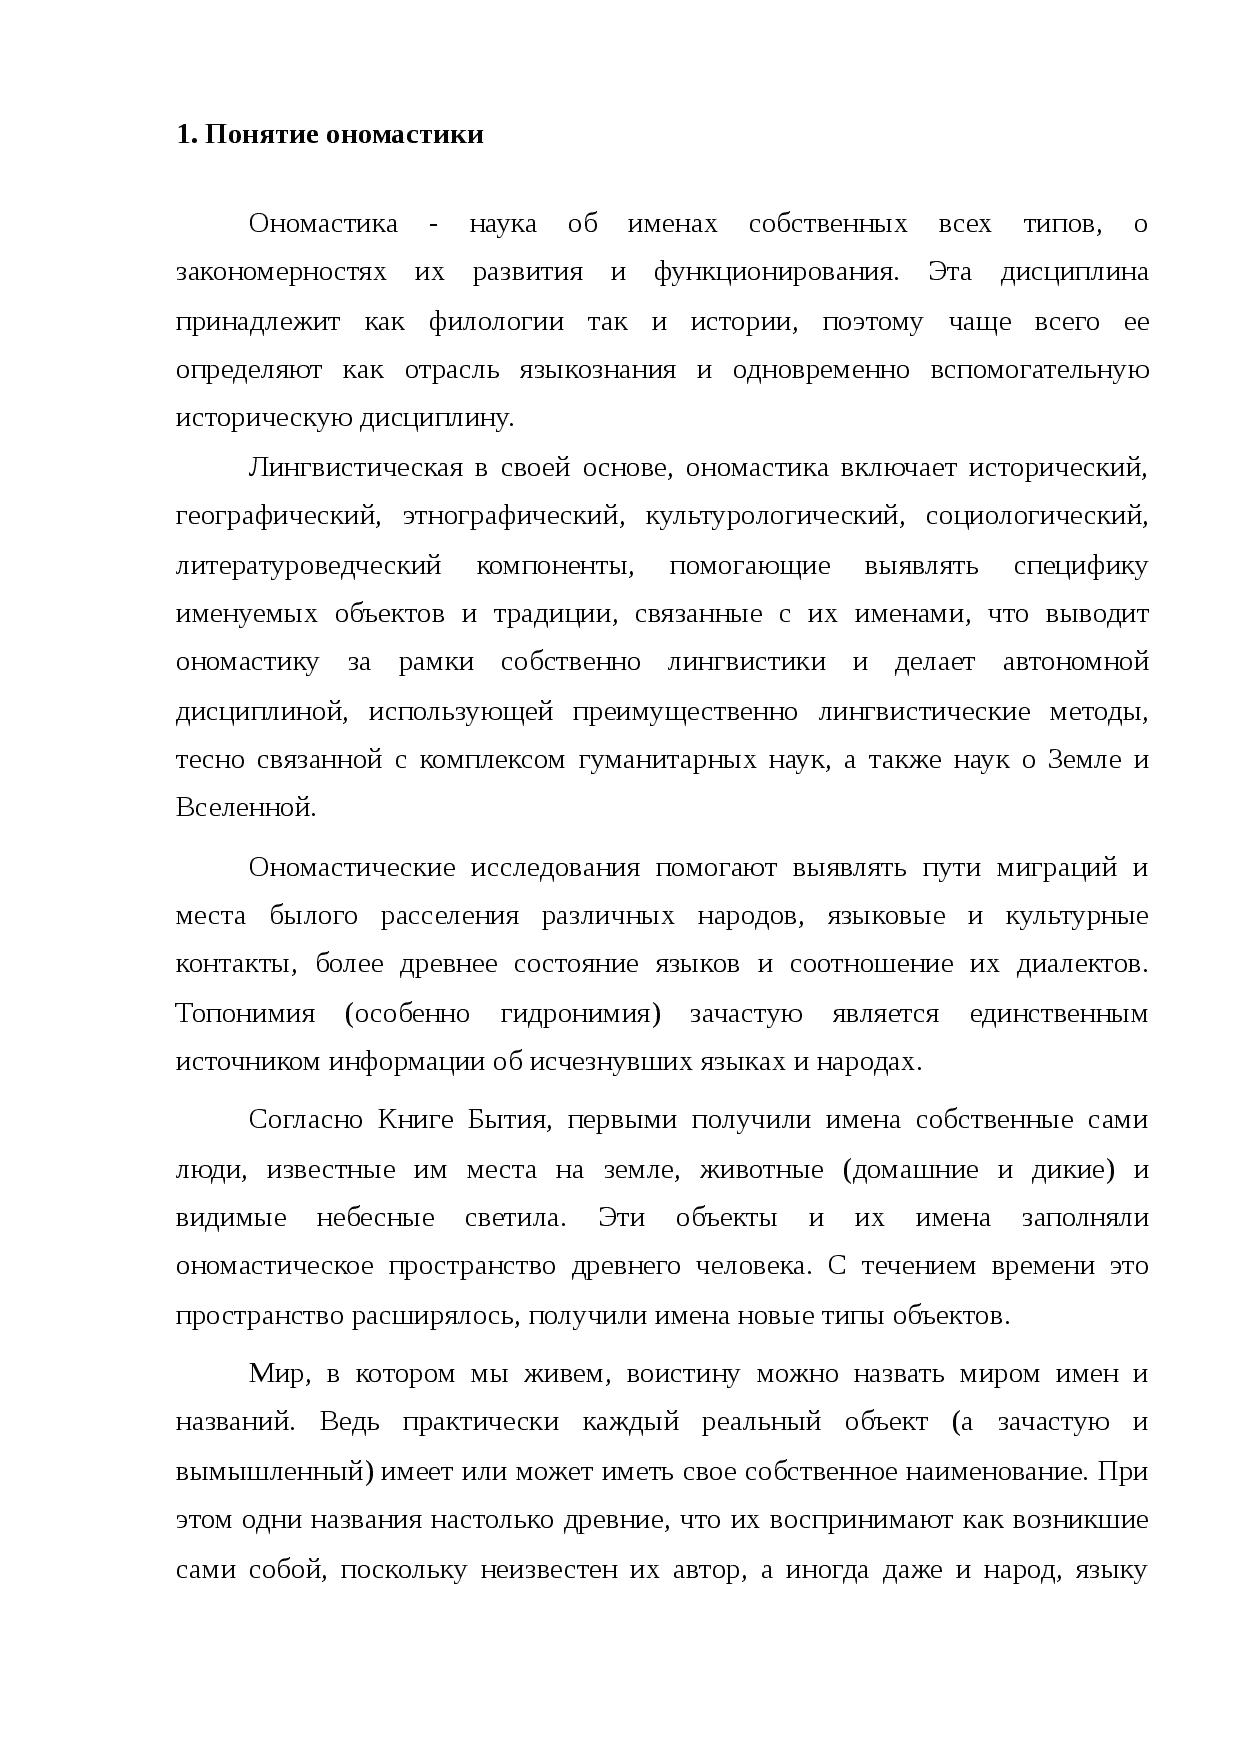 Ономастика — википедия. что такое ономастика